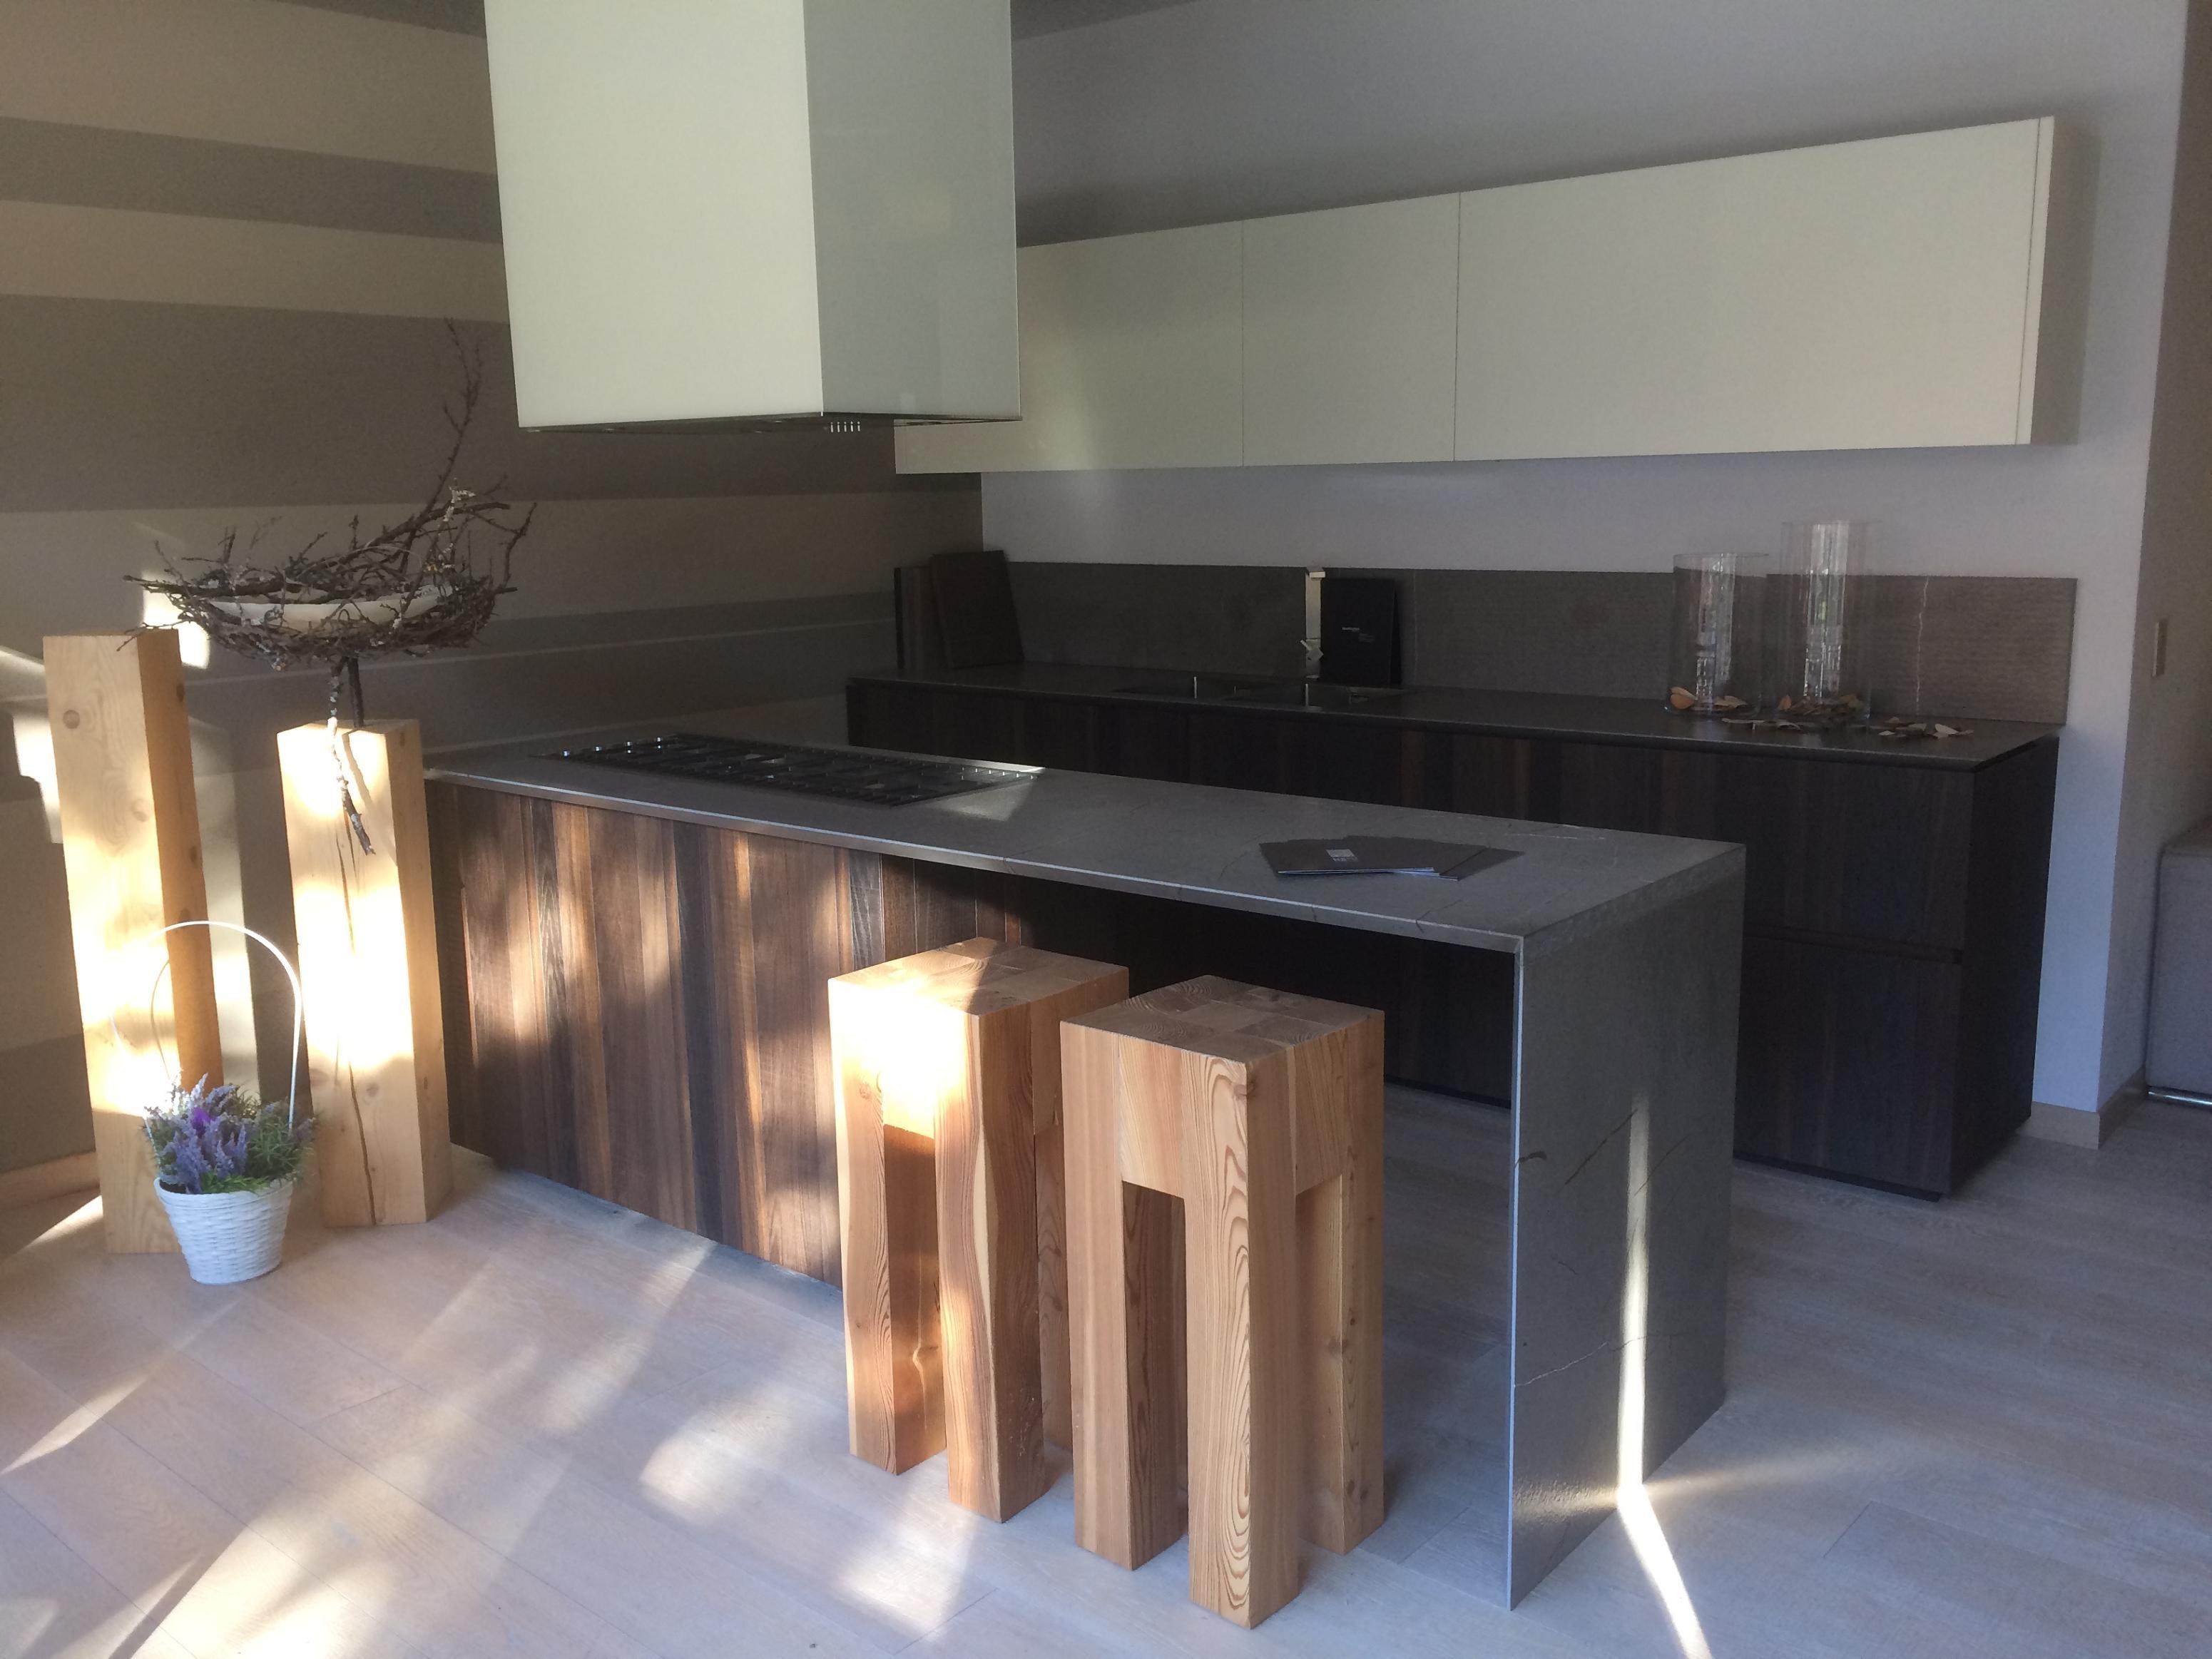 Best Outlet Arredamento Brescia Gallery - Home Design Ideas 2017 ...